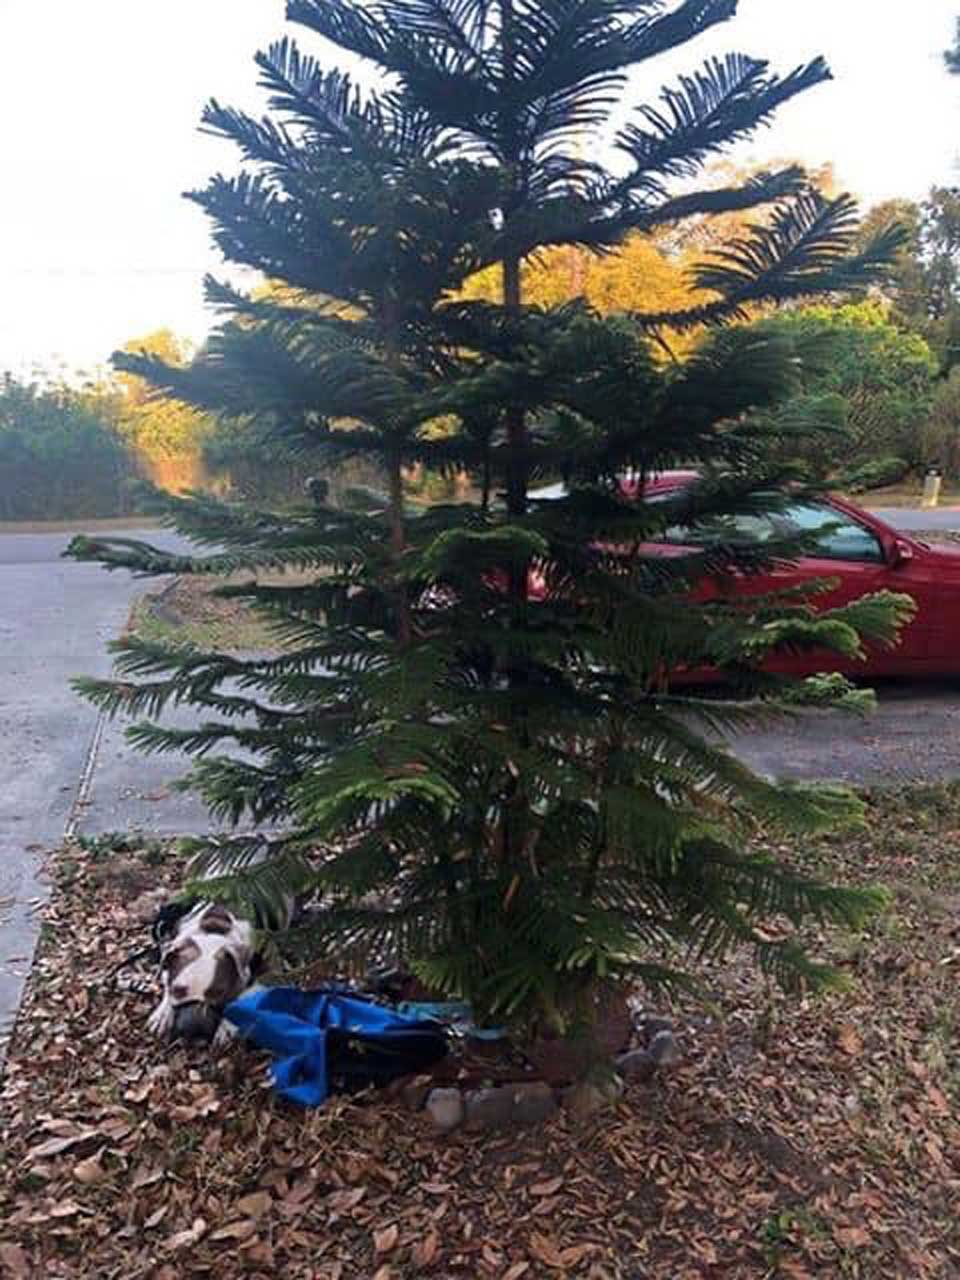 Perrito abandonado cerca a árbol